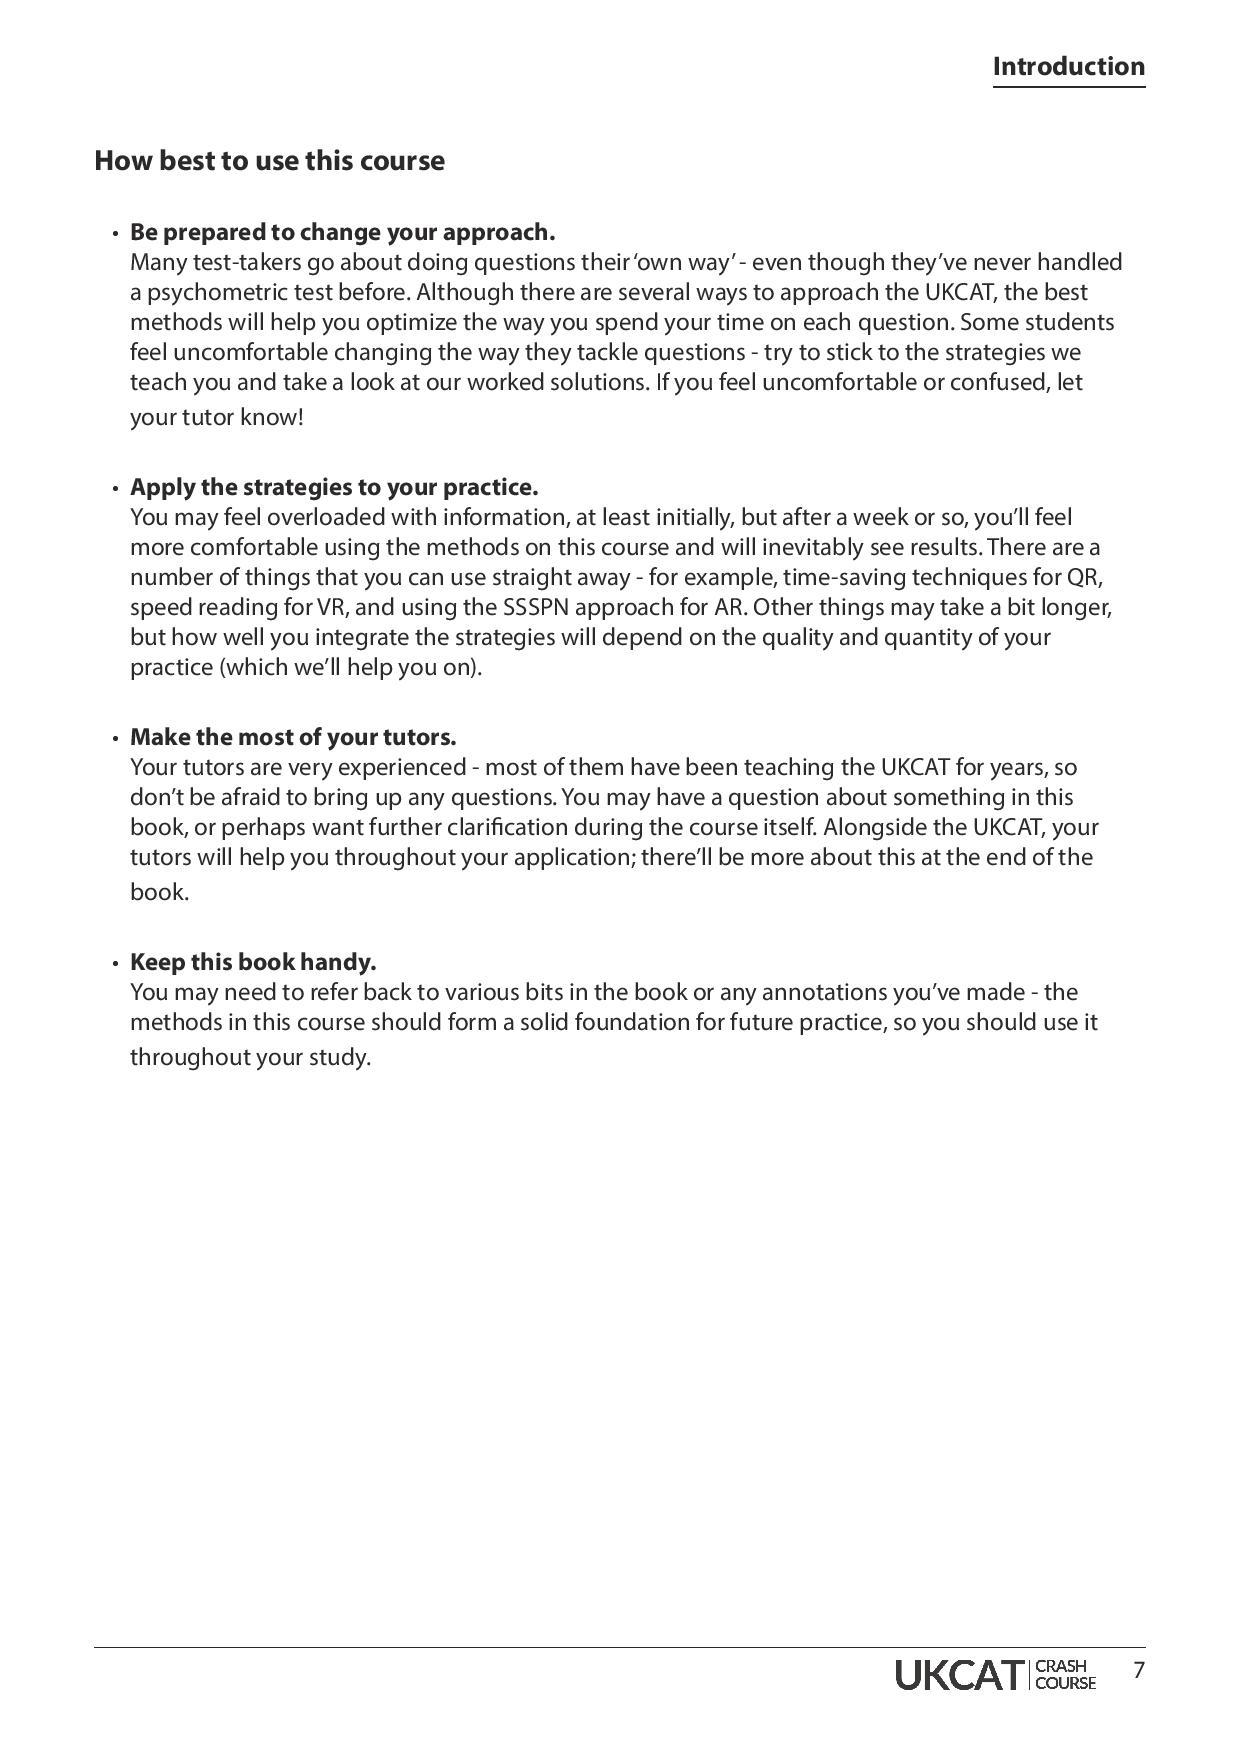 UKCAT Crash Course Handbook page 6